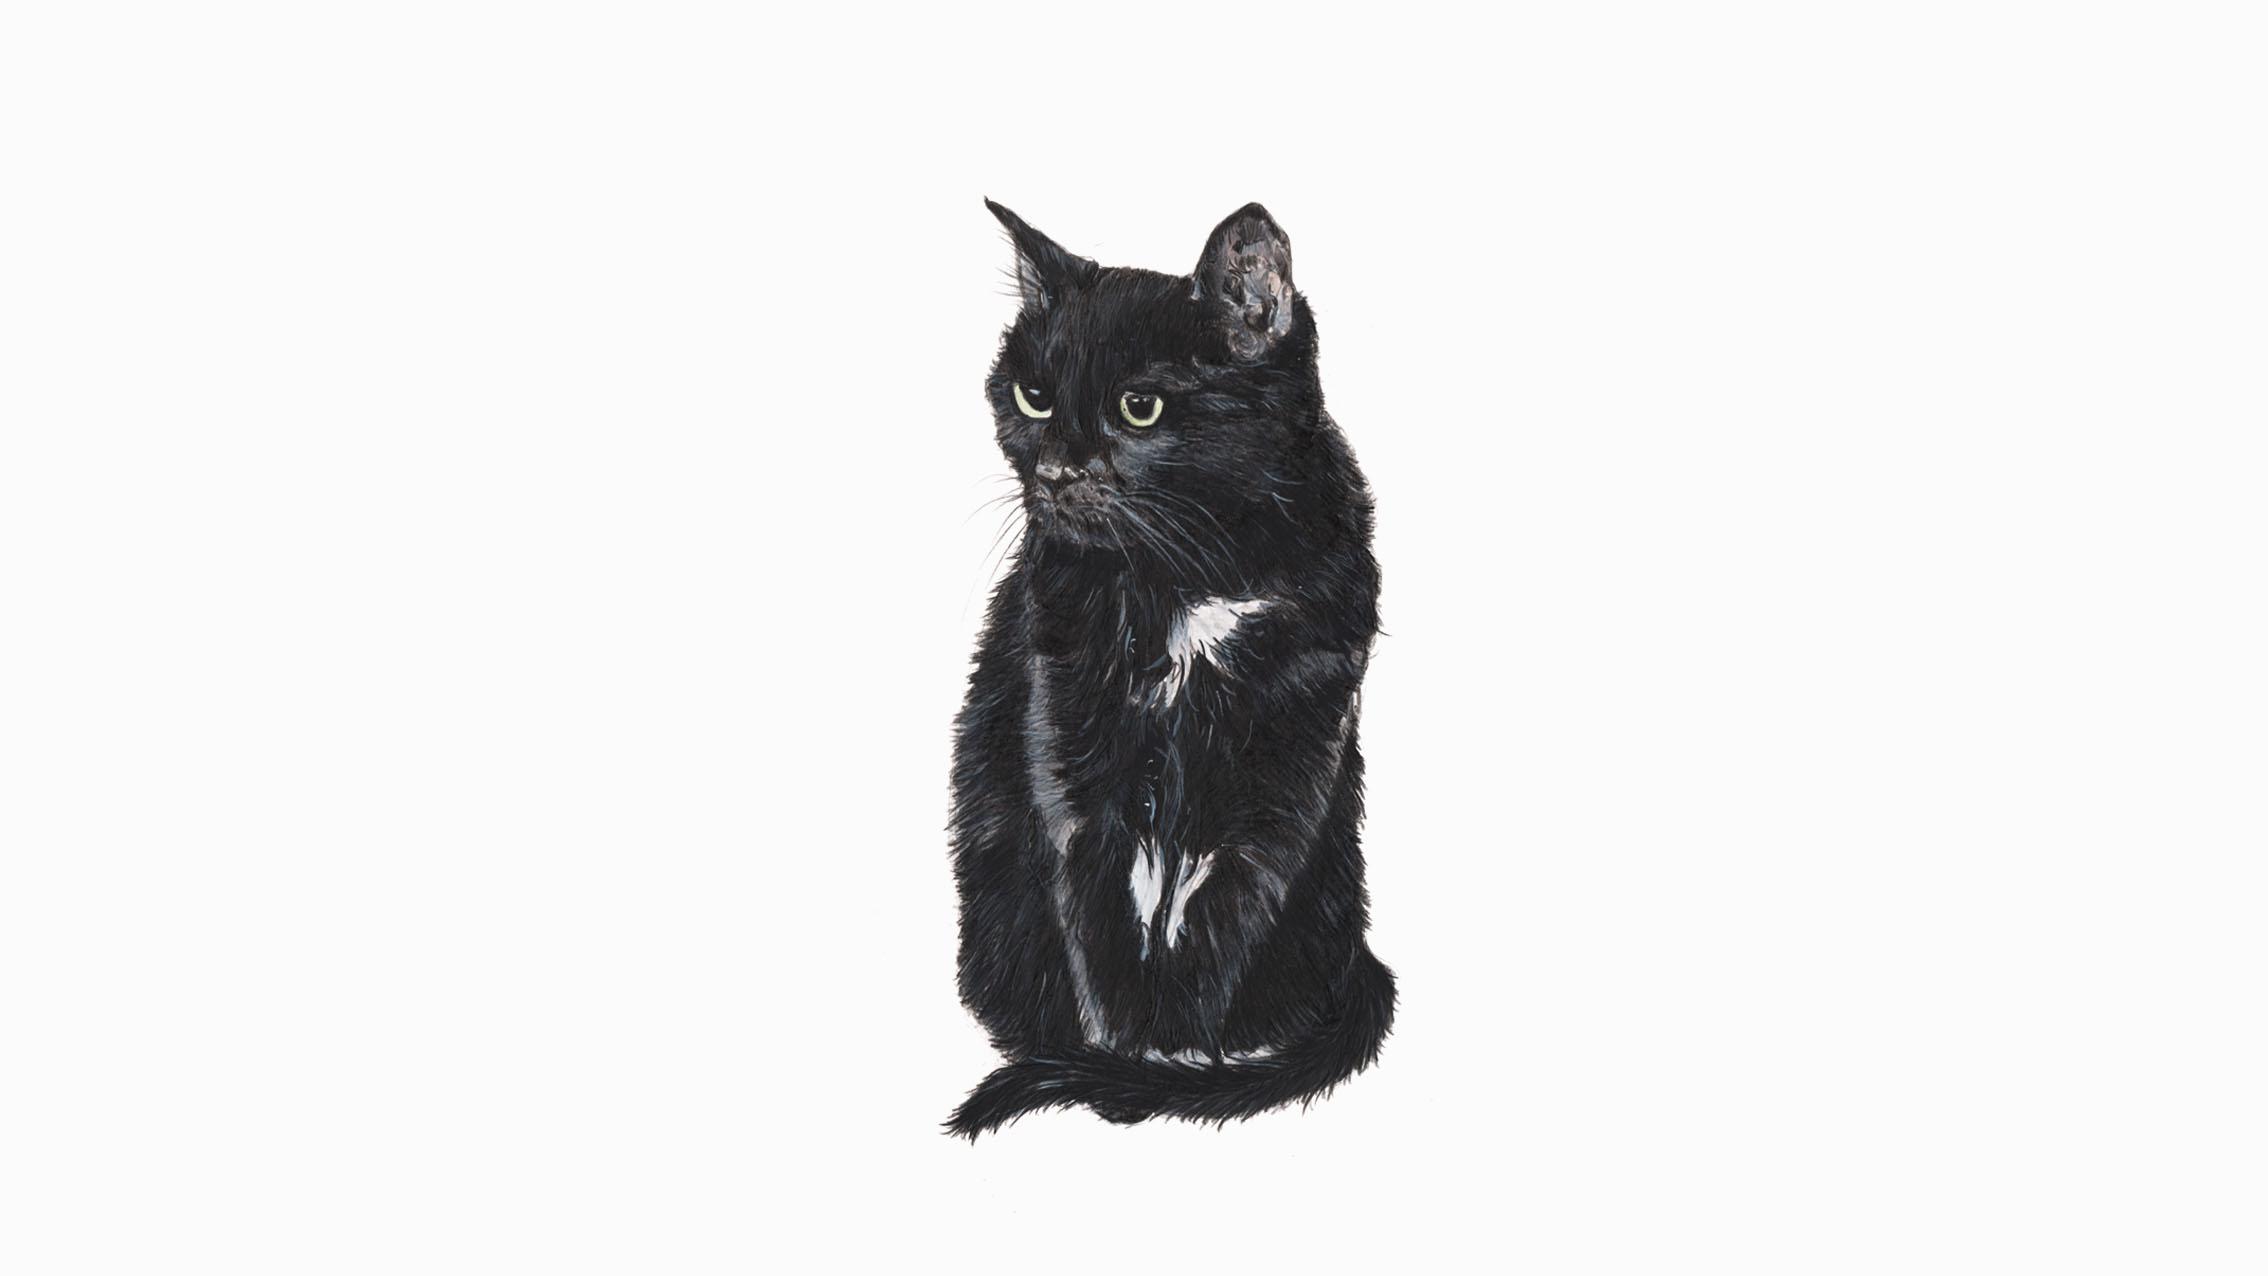 Poppy (Bob), the Black Cat